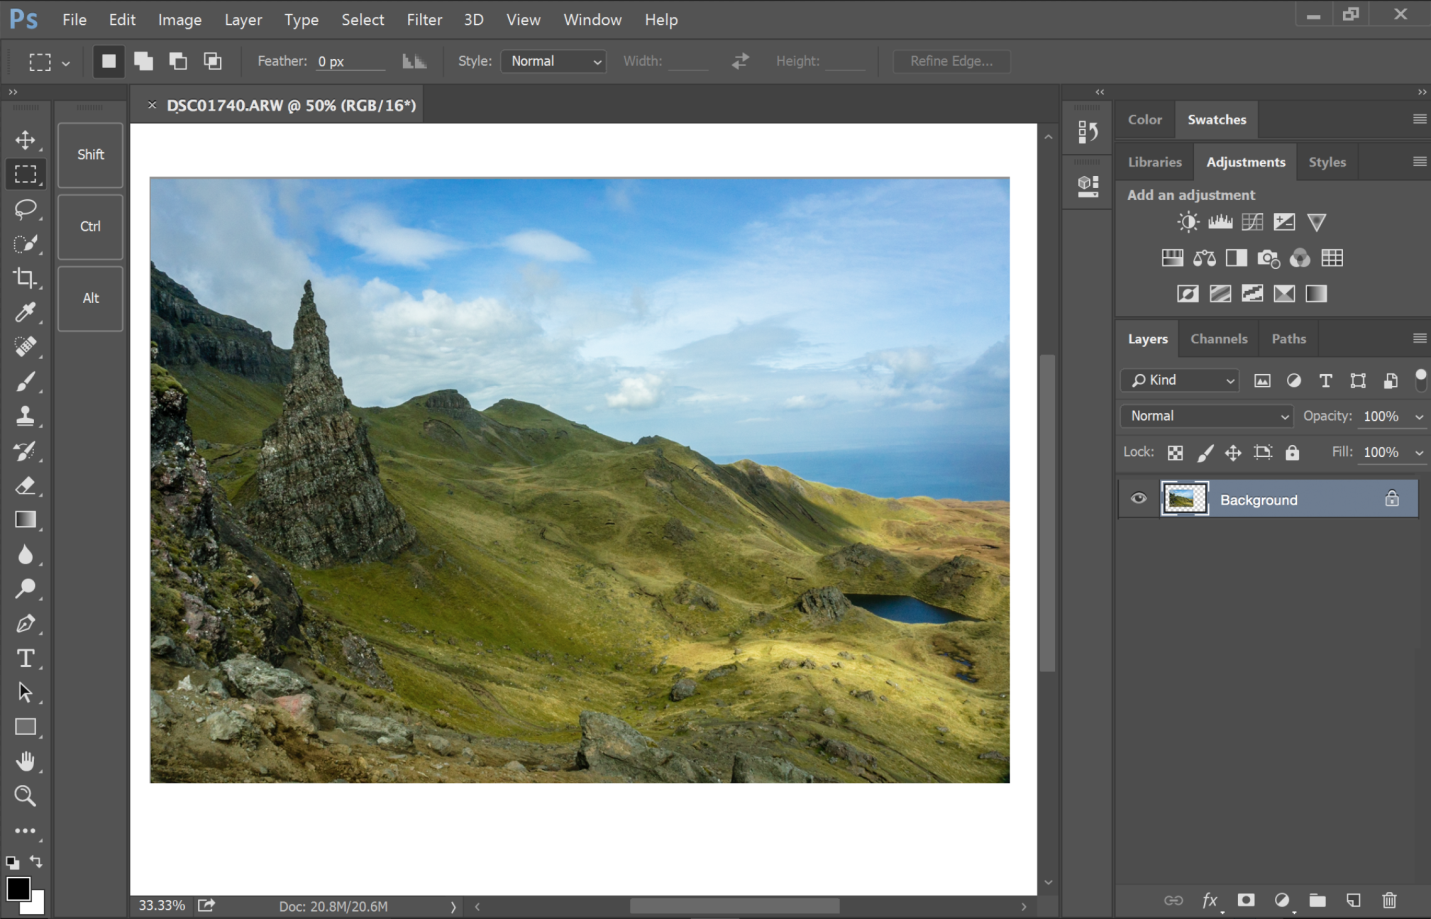 интерфейс Adobe Photoshop